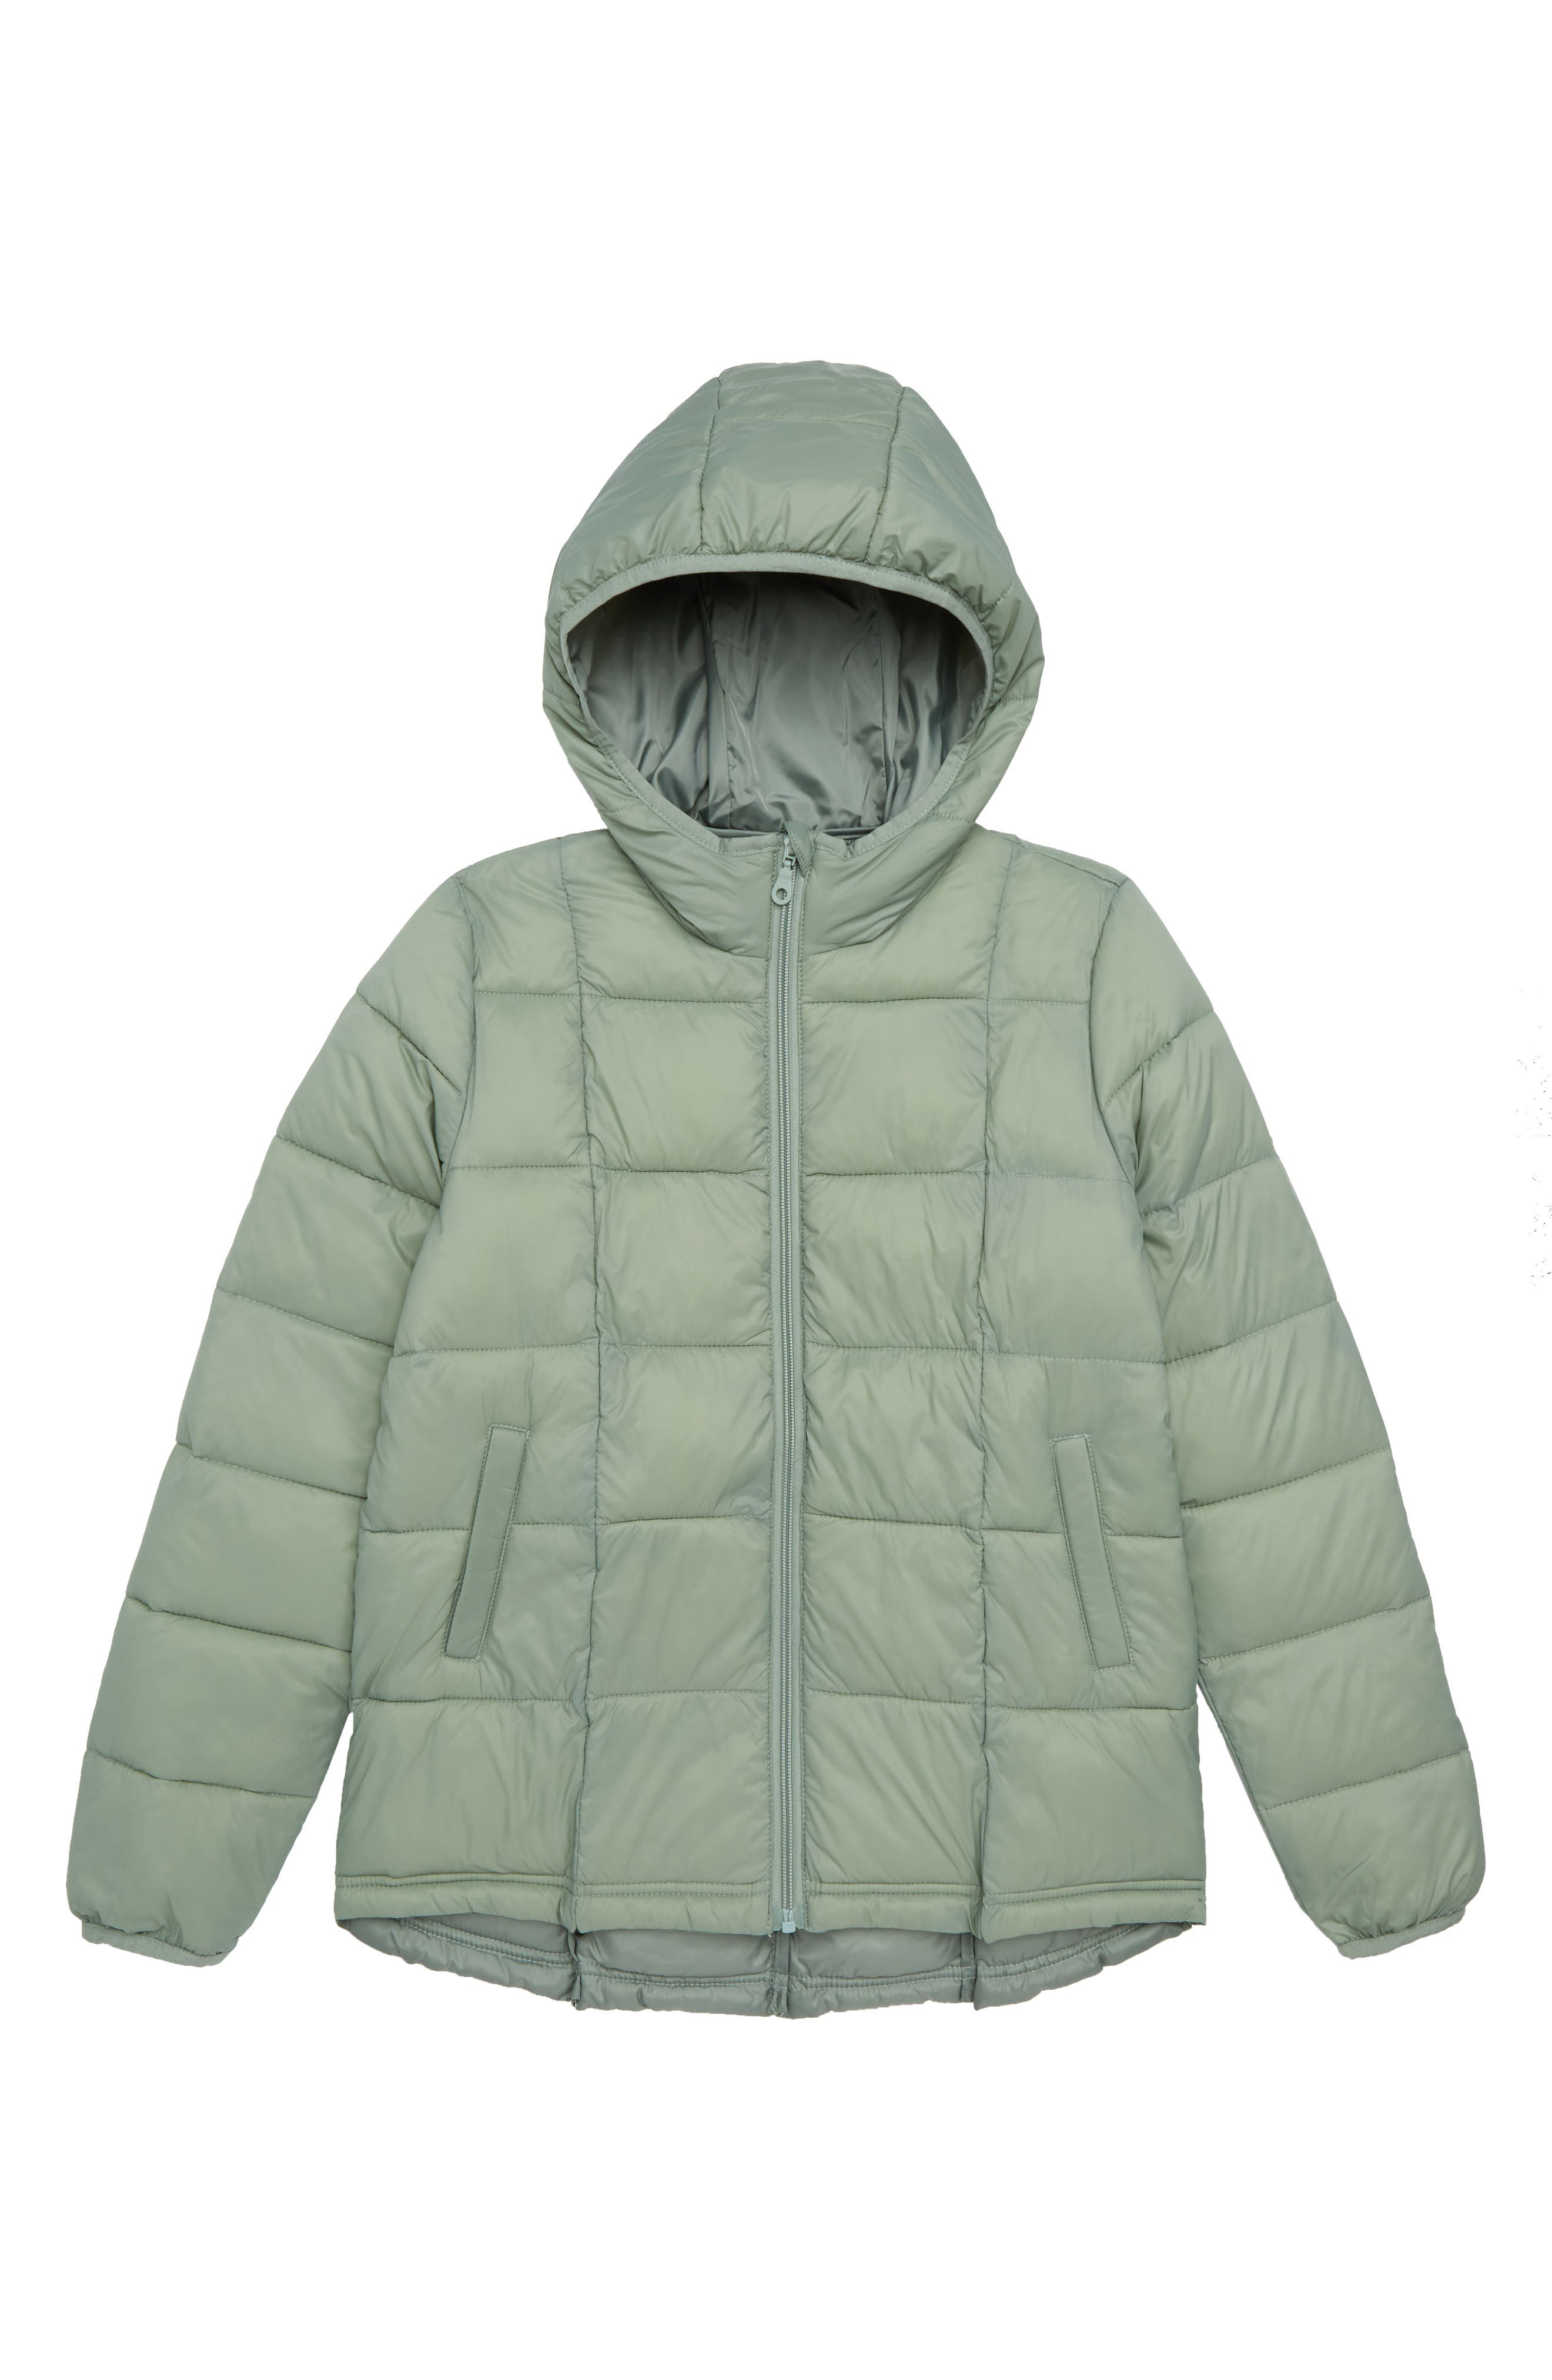 Packable Puffer Jacket,                             Main thumbnail 1, color,                             GREEN SEA SPRAY